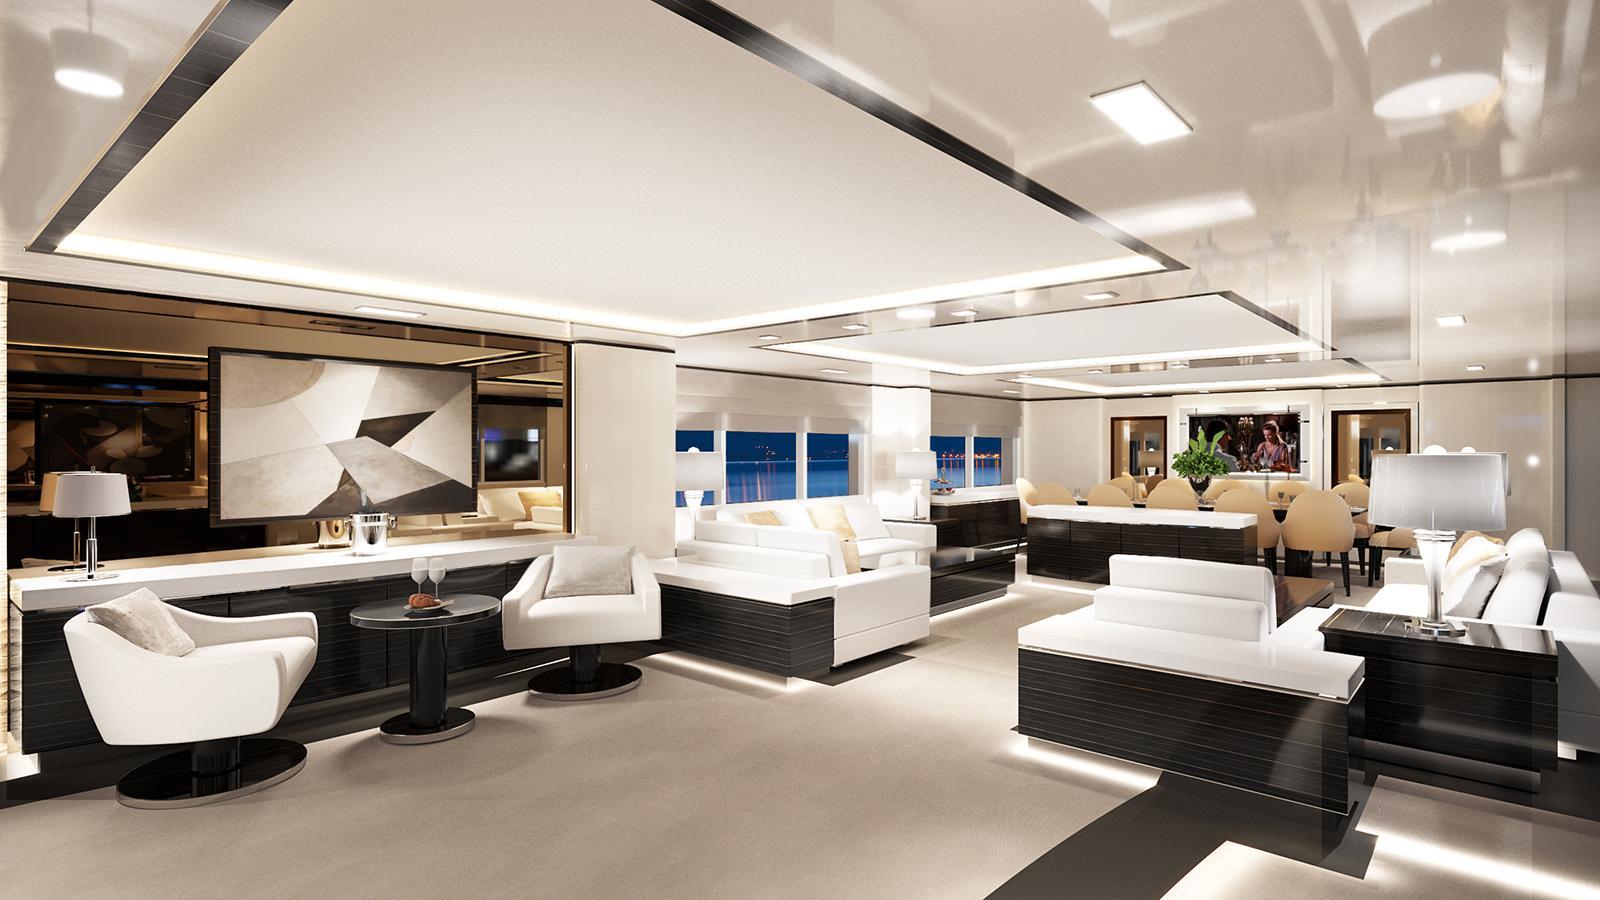 o mathilde motoryacht golden yachts 57m 2018 rendering saloon